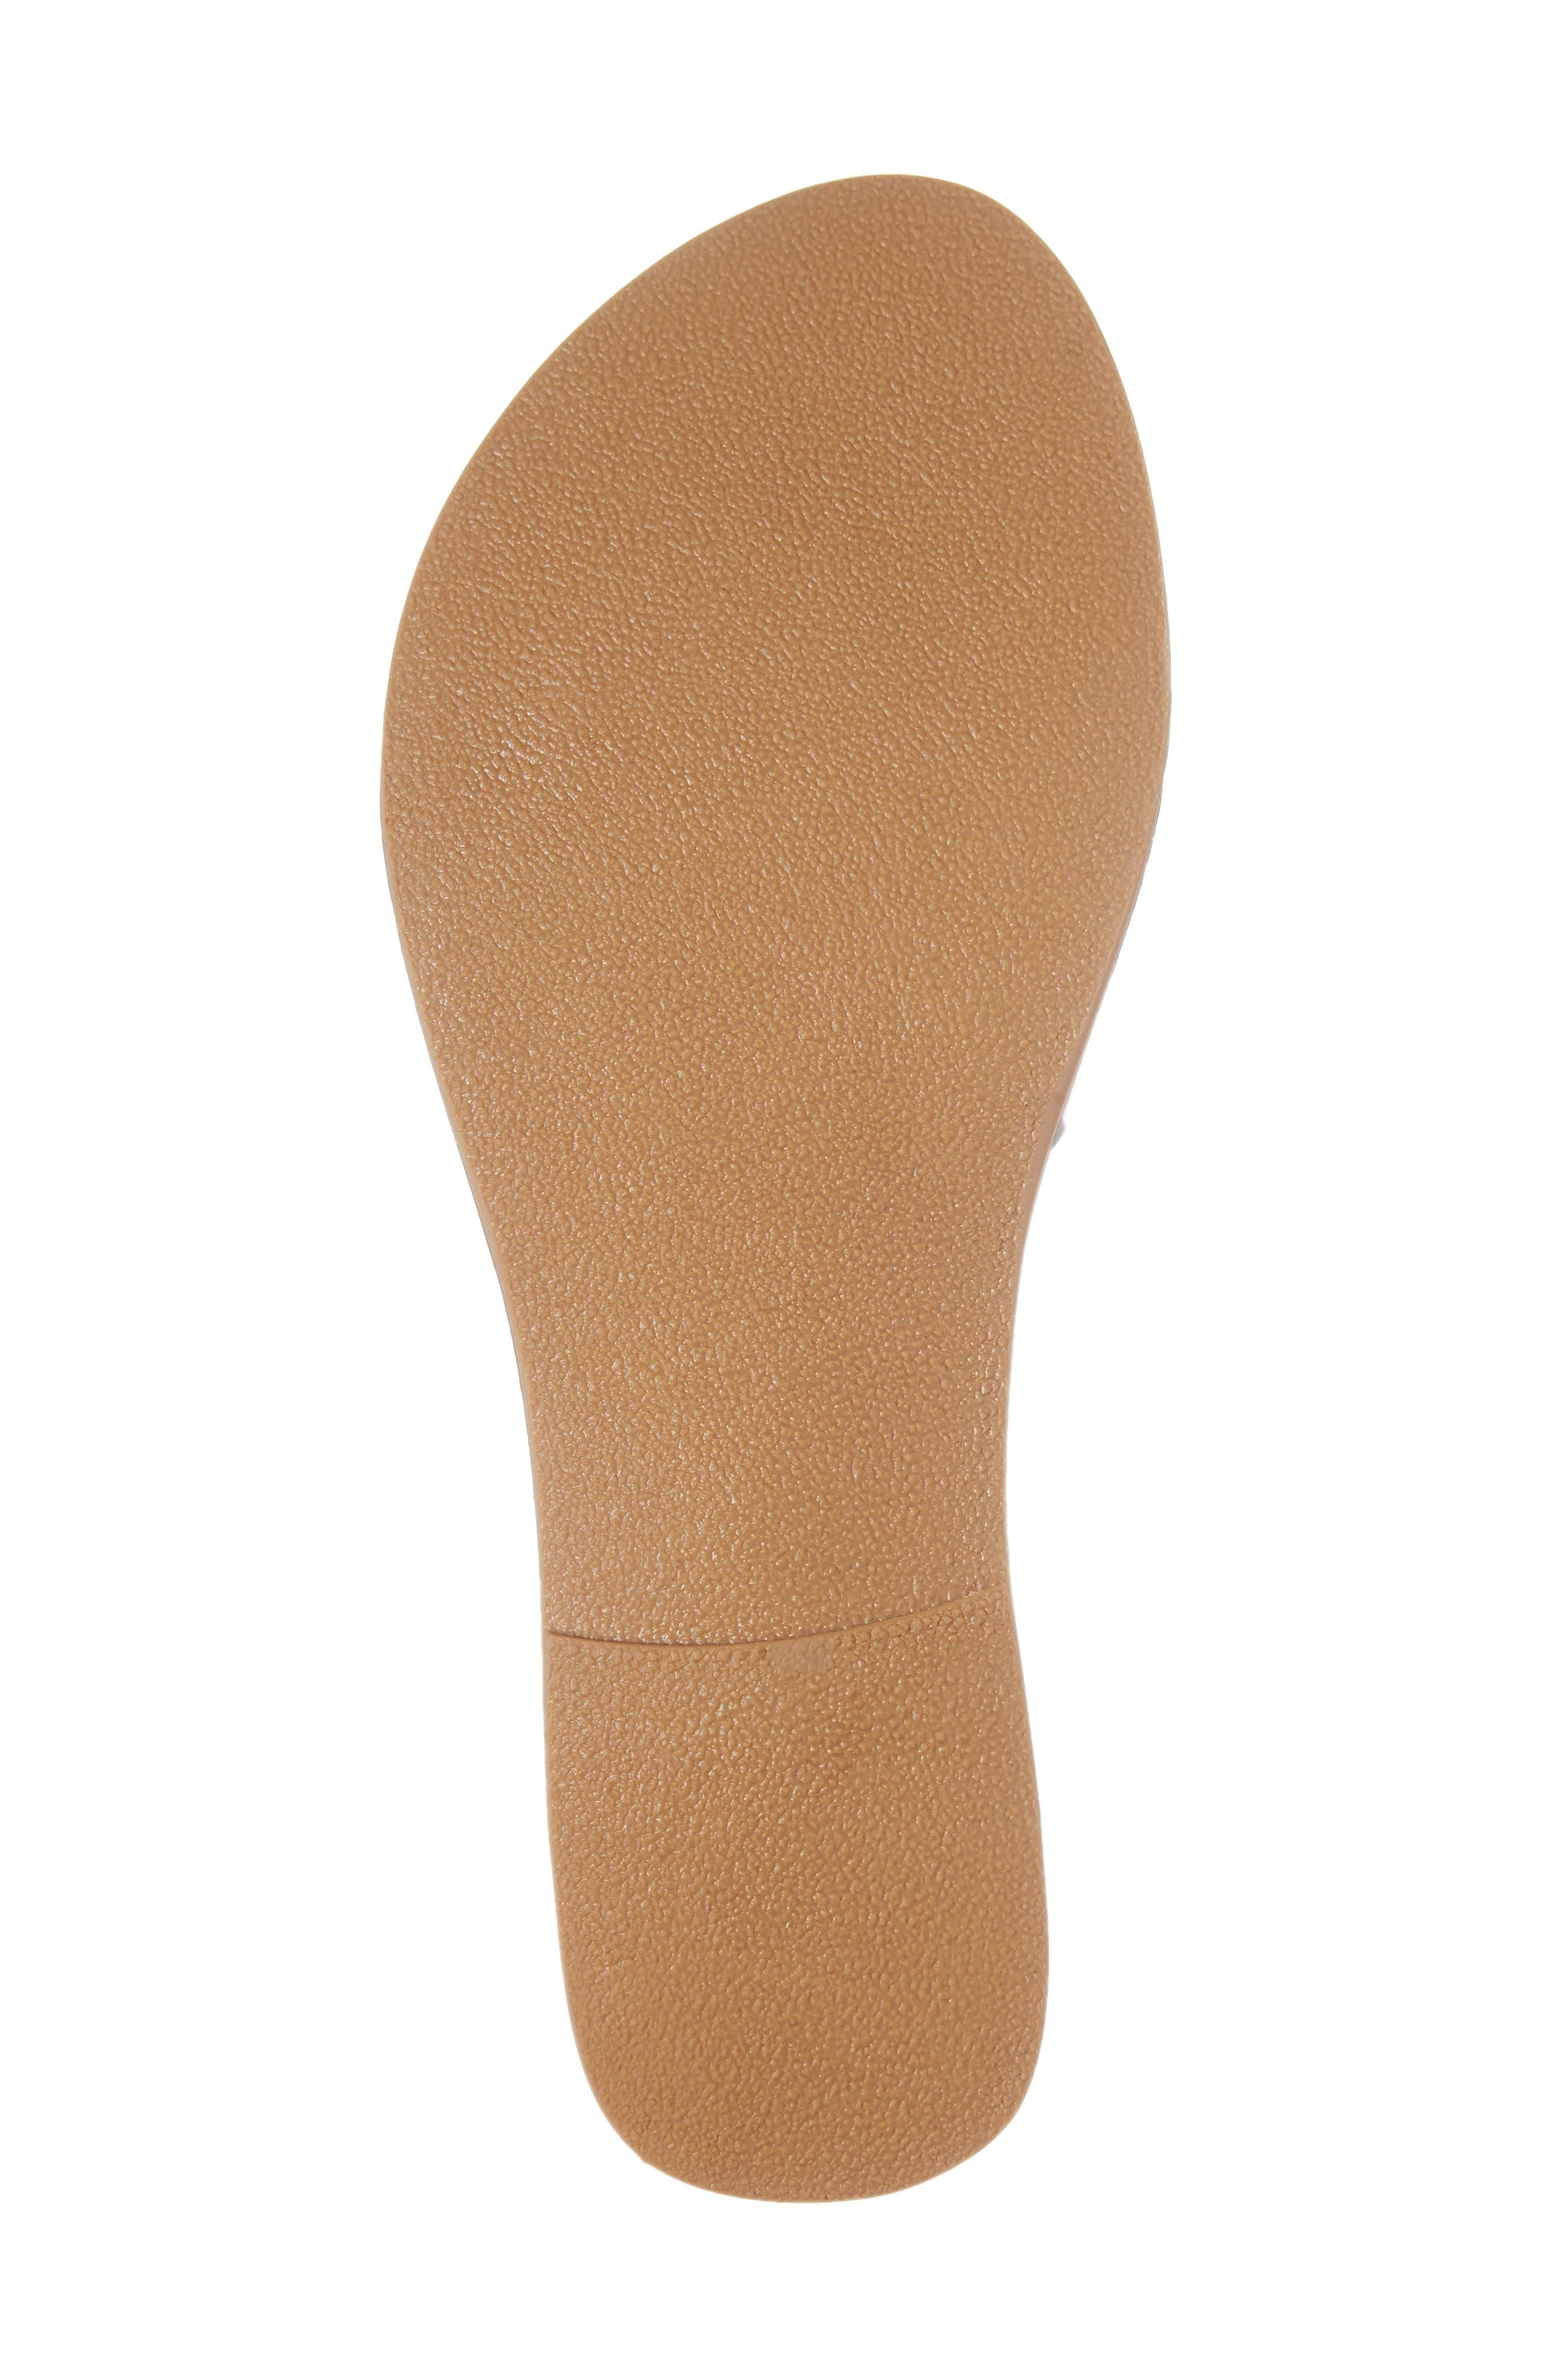 Cabana Slide Sandal,                             Alternate thumbnail 6, color,                             Ice Leather